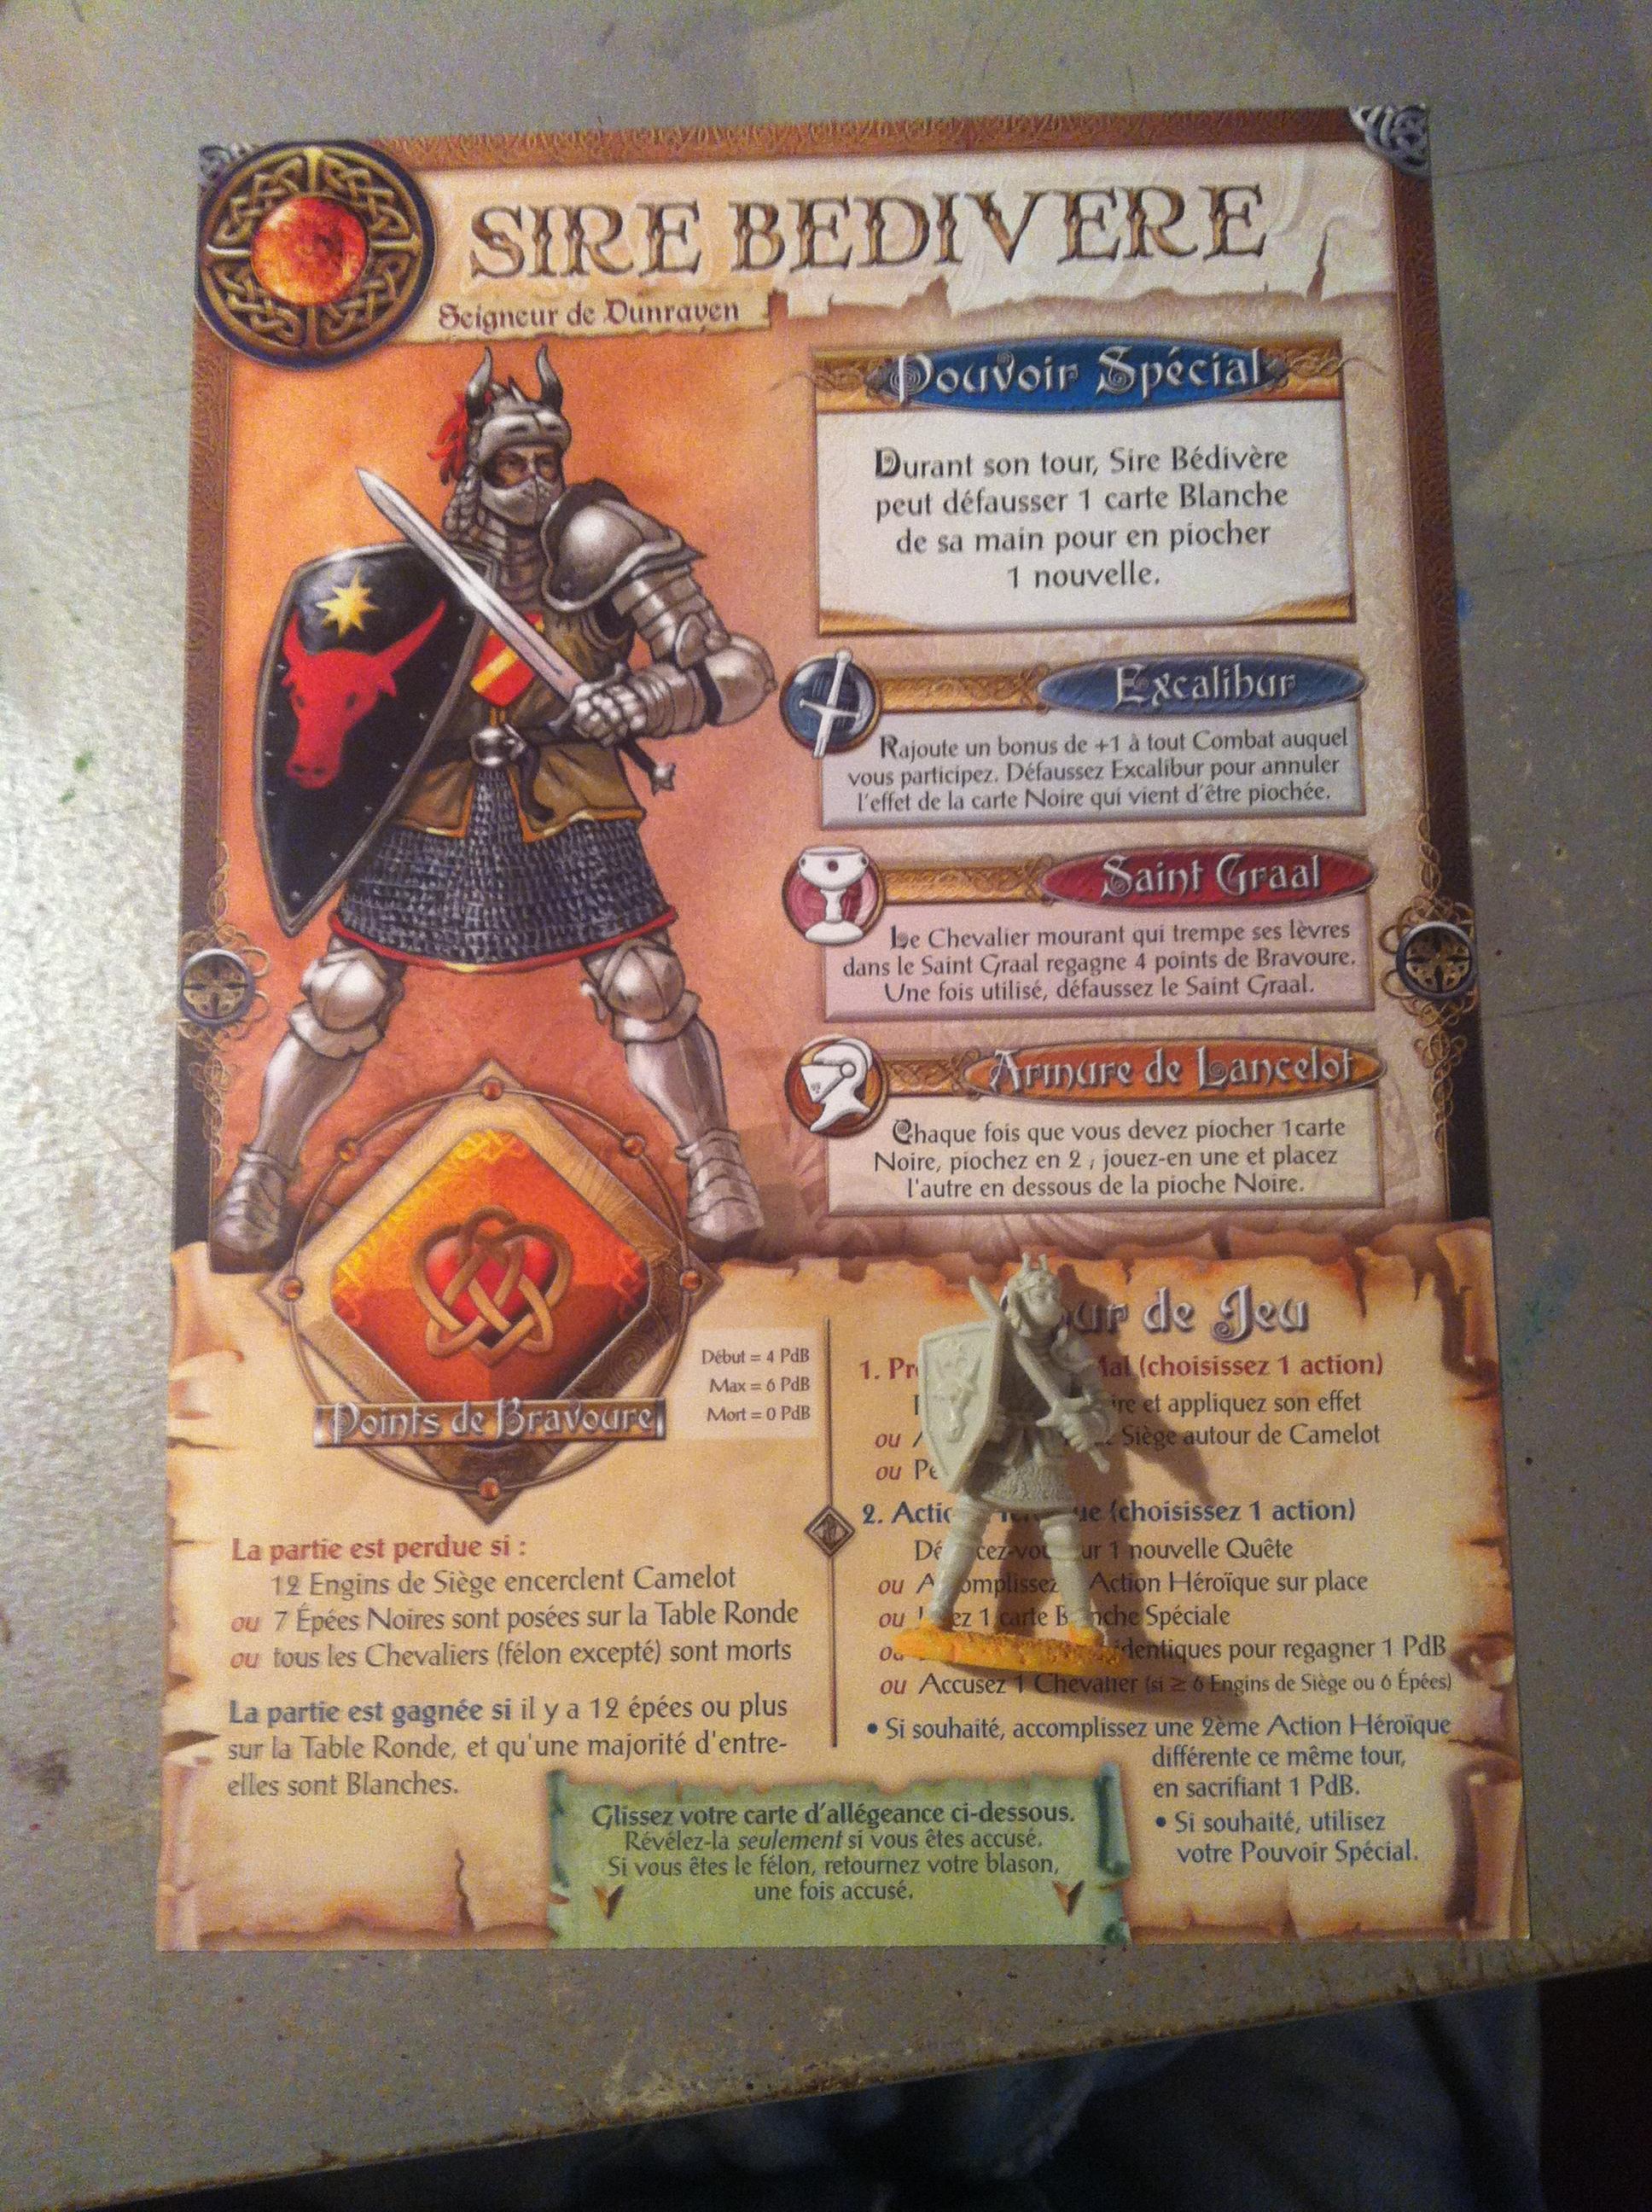 Acheter les chevaliers de la table ronde sire b div re d - Recherche sur les chevaliers de la table ronde ...